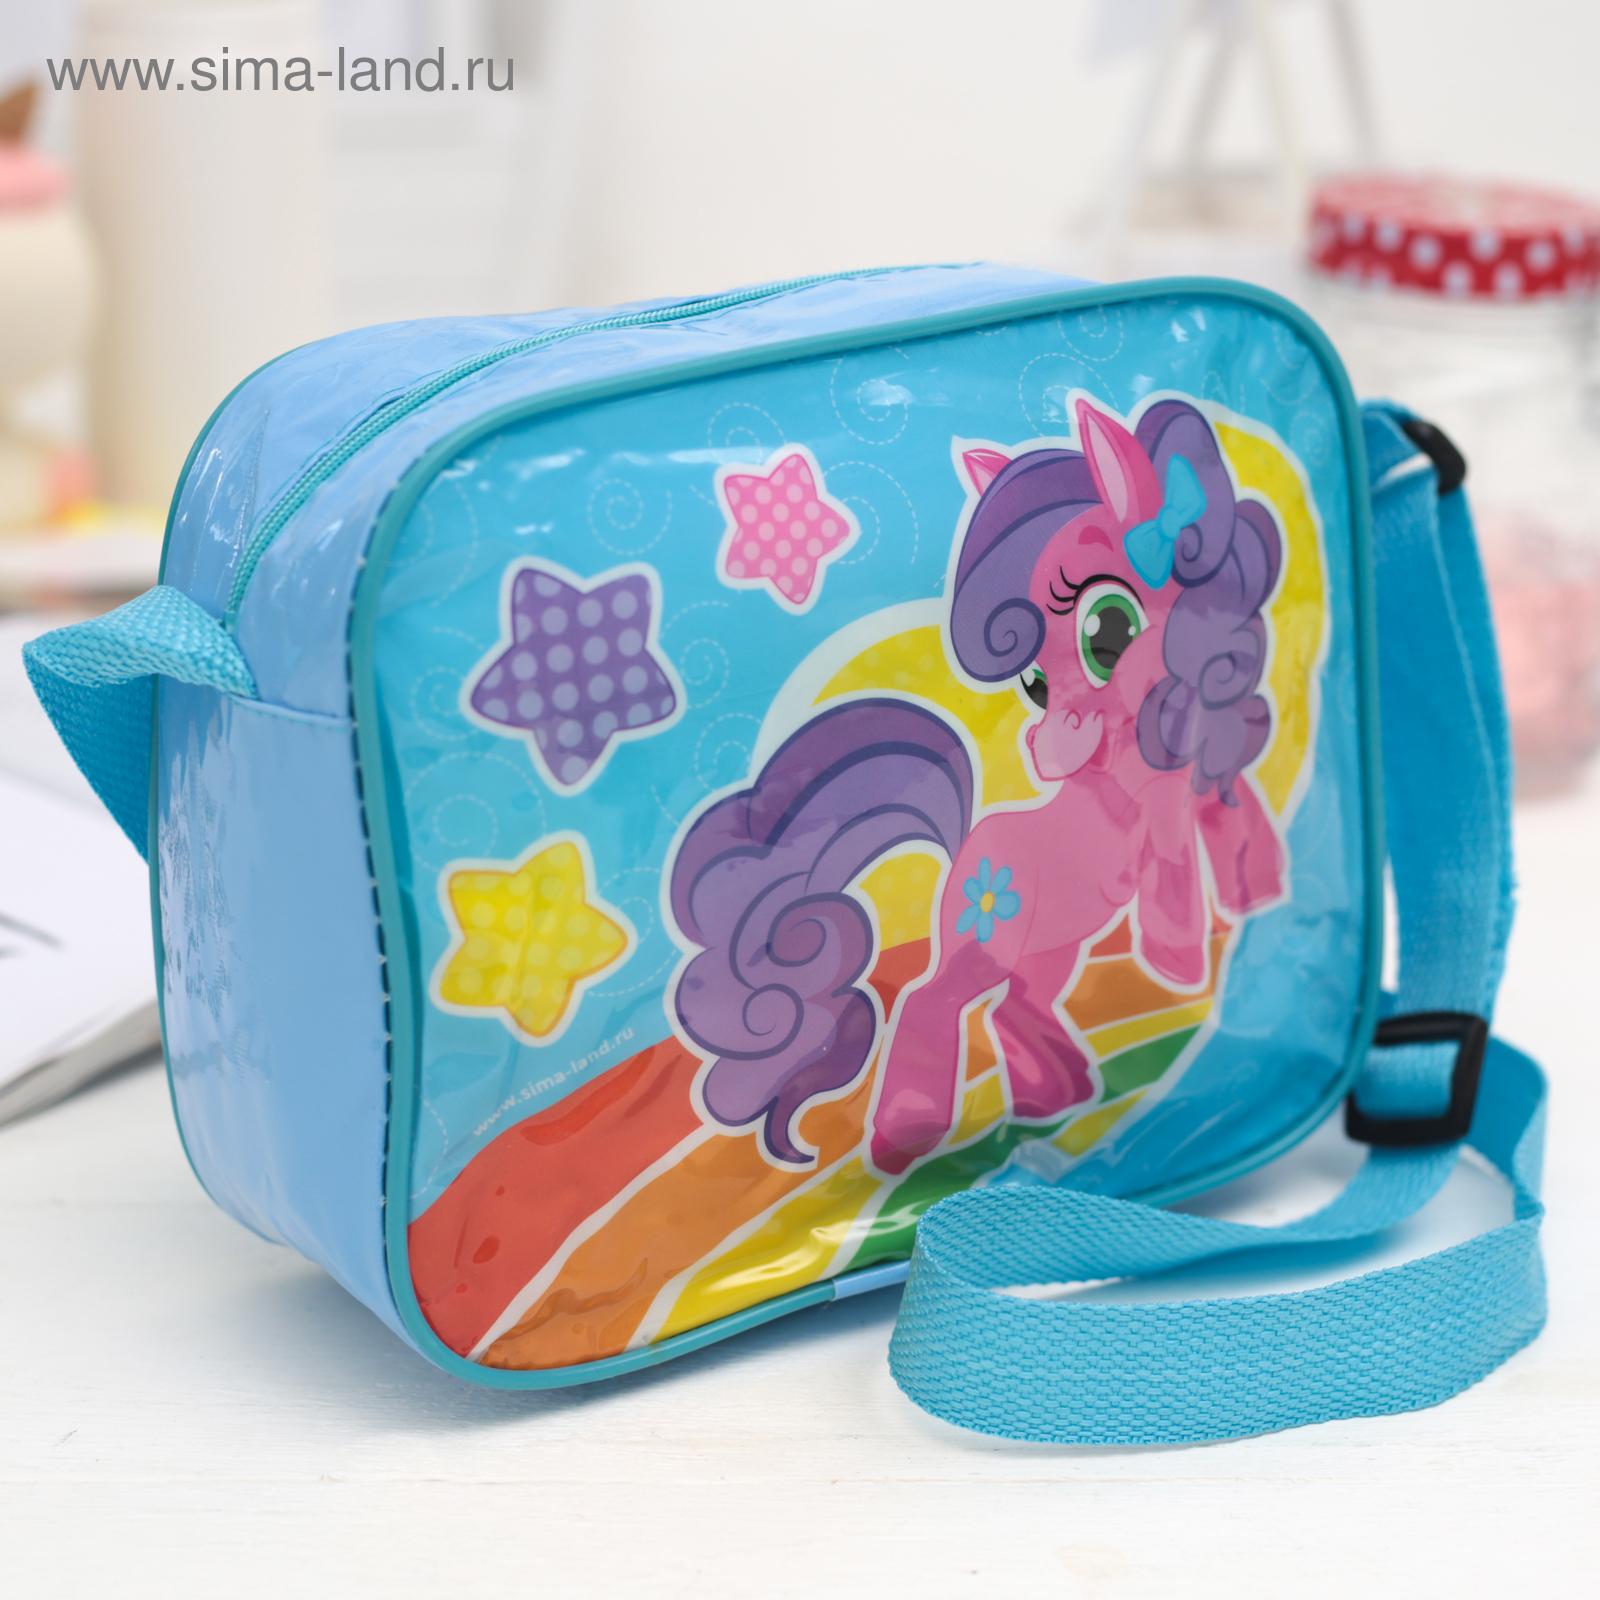 b621e8ca9b25 Детская сумочка